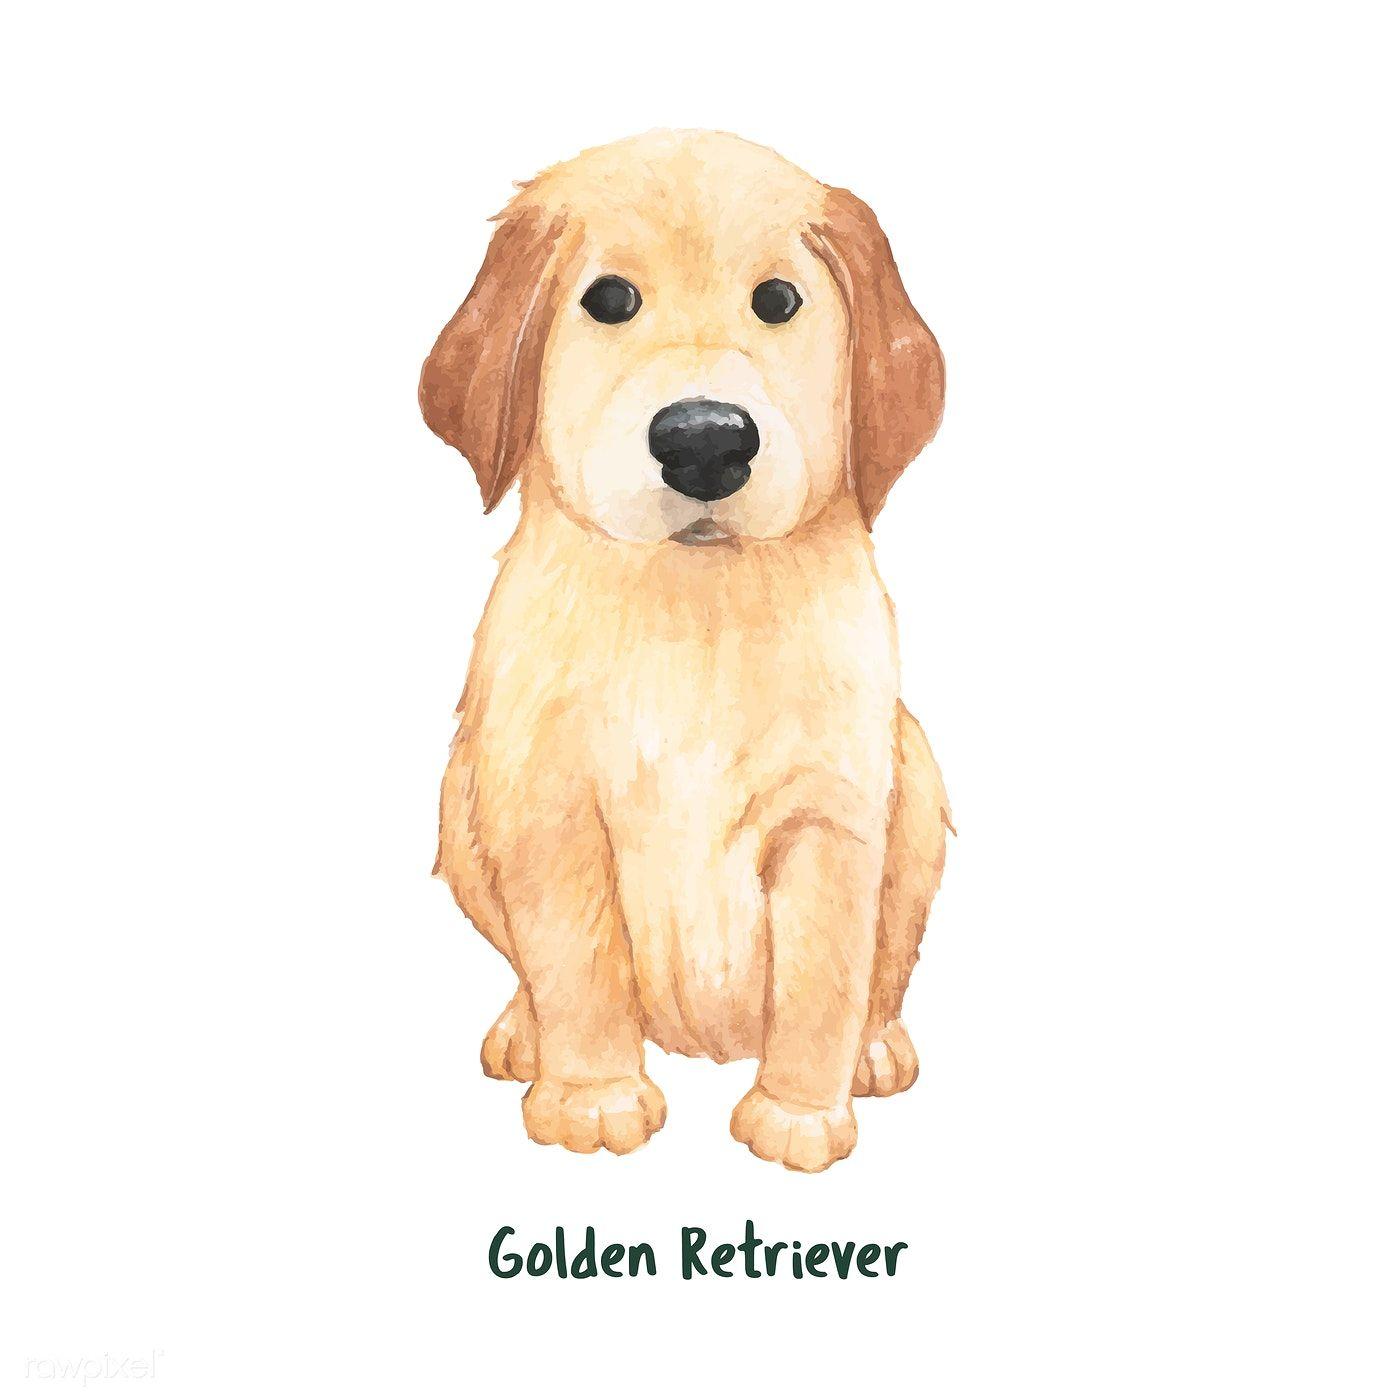 Hand Drawn Golden Retriever Dog Premium Image By Rawpixel Com Aum In 2020 Golden Retriever Cartoon Golden Retriever Illustration Golden Retriever Drawing